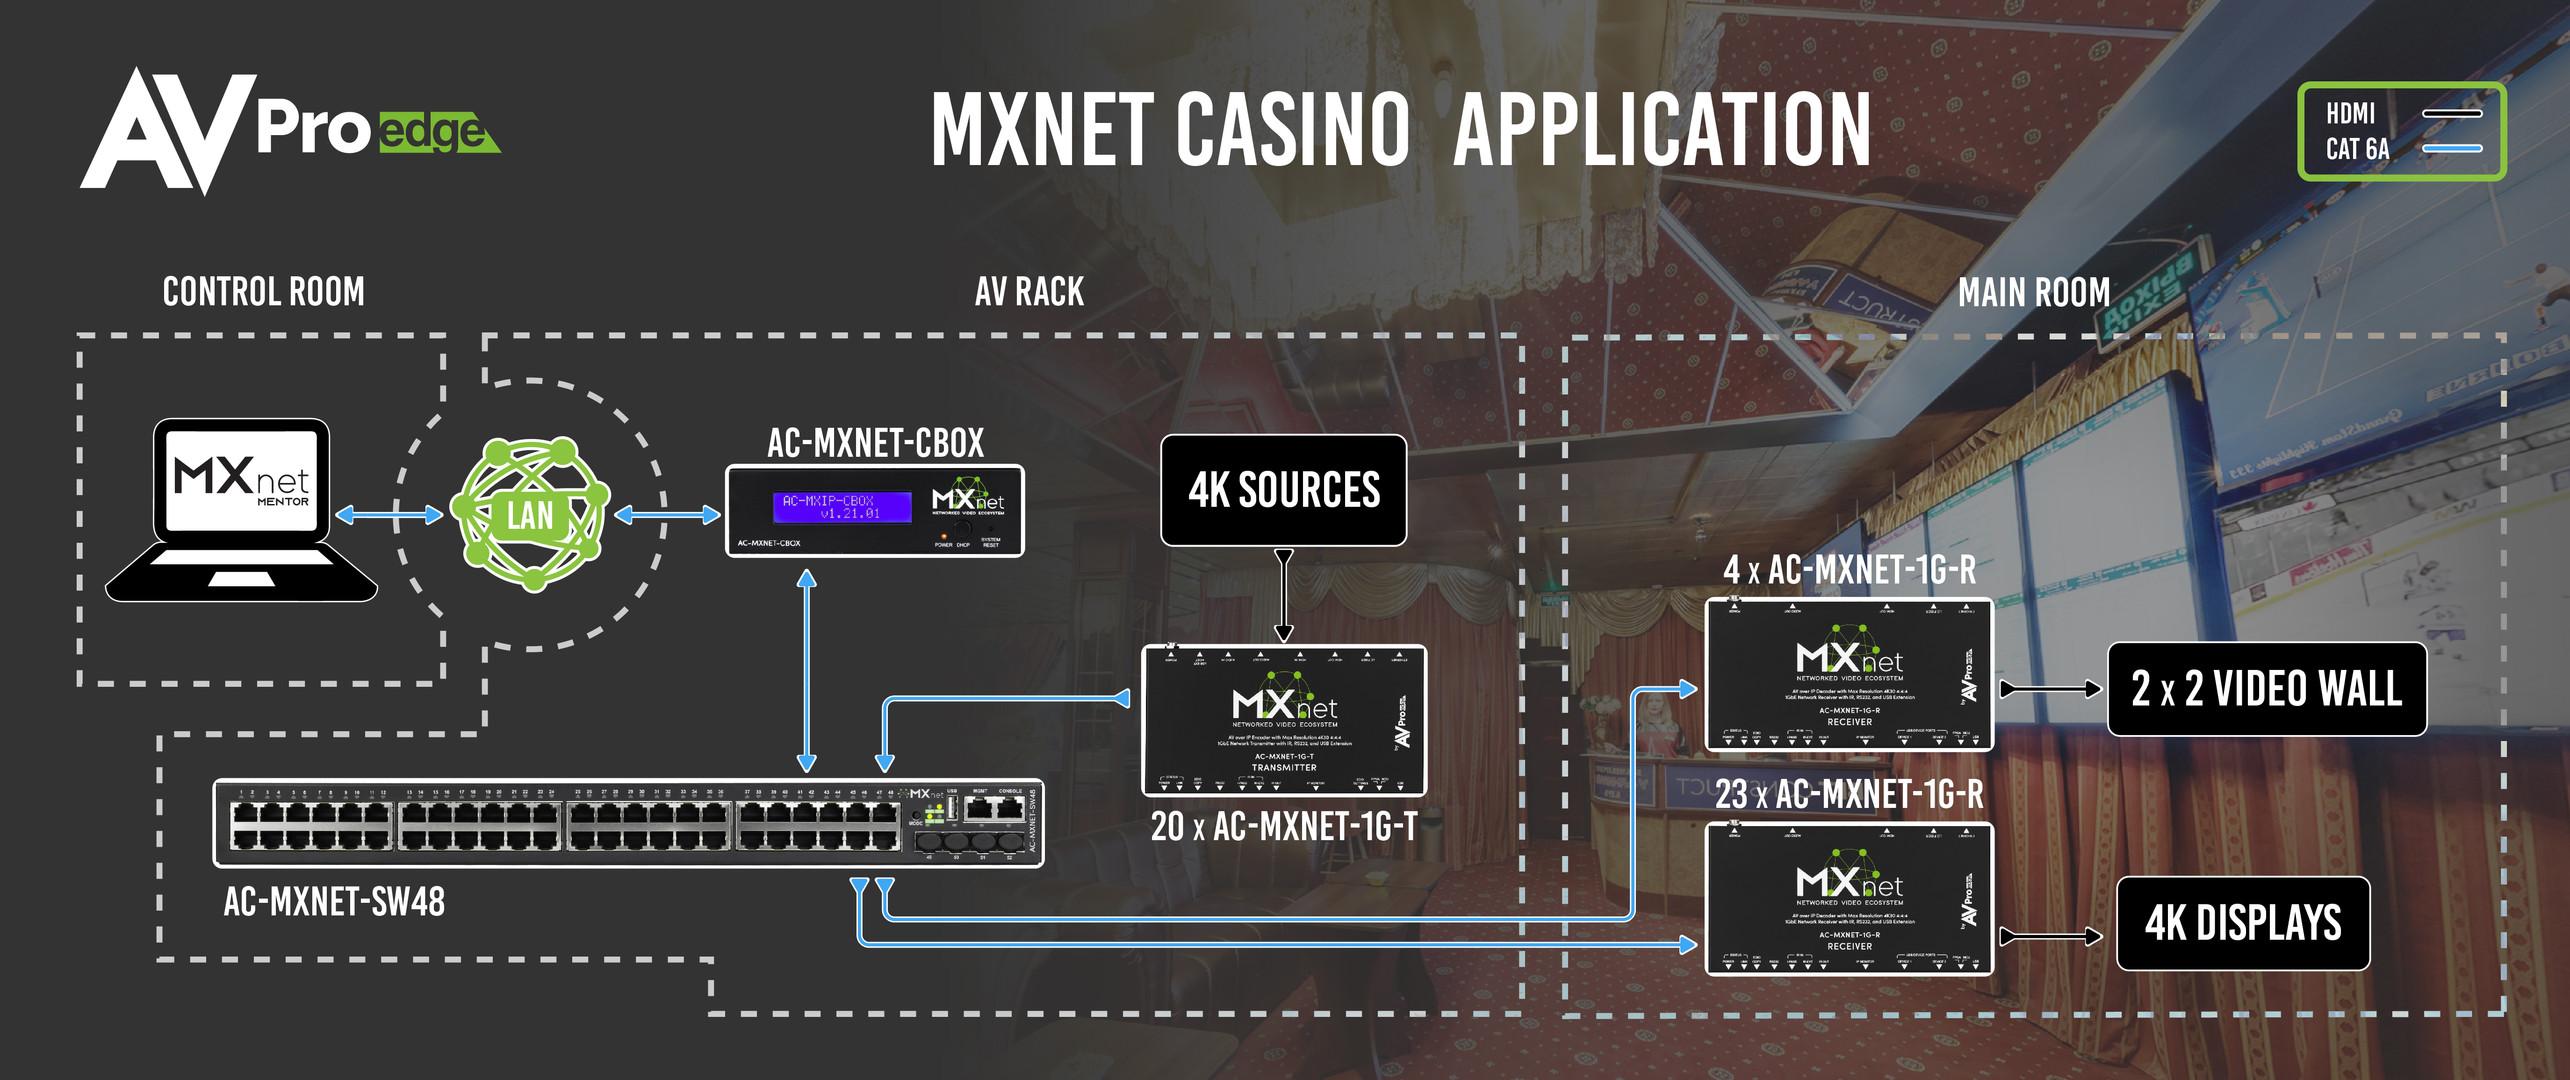 MX Net Casino Application-01.jpg